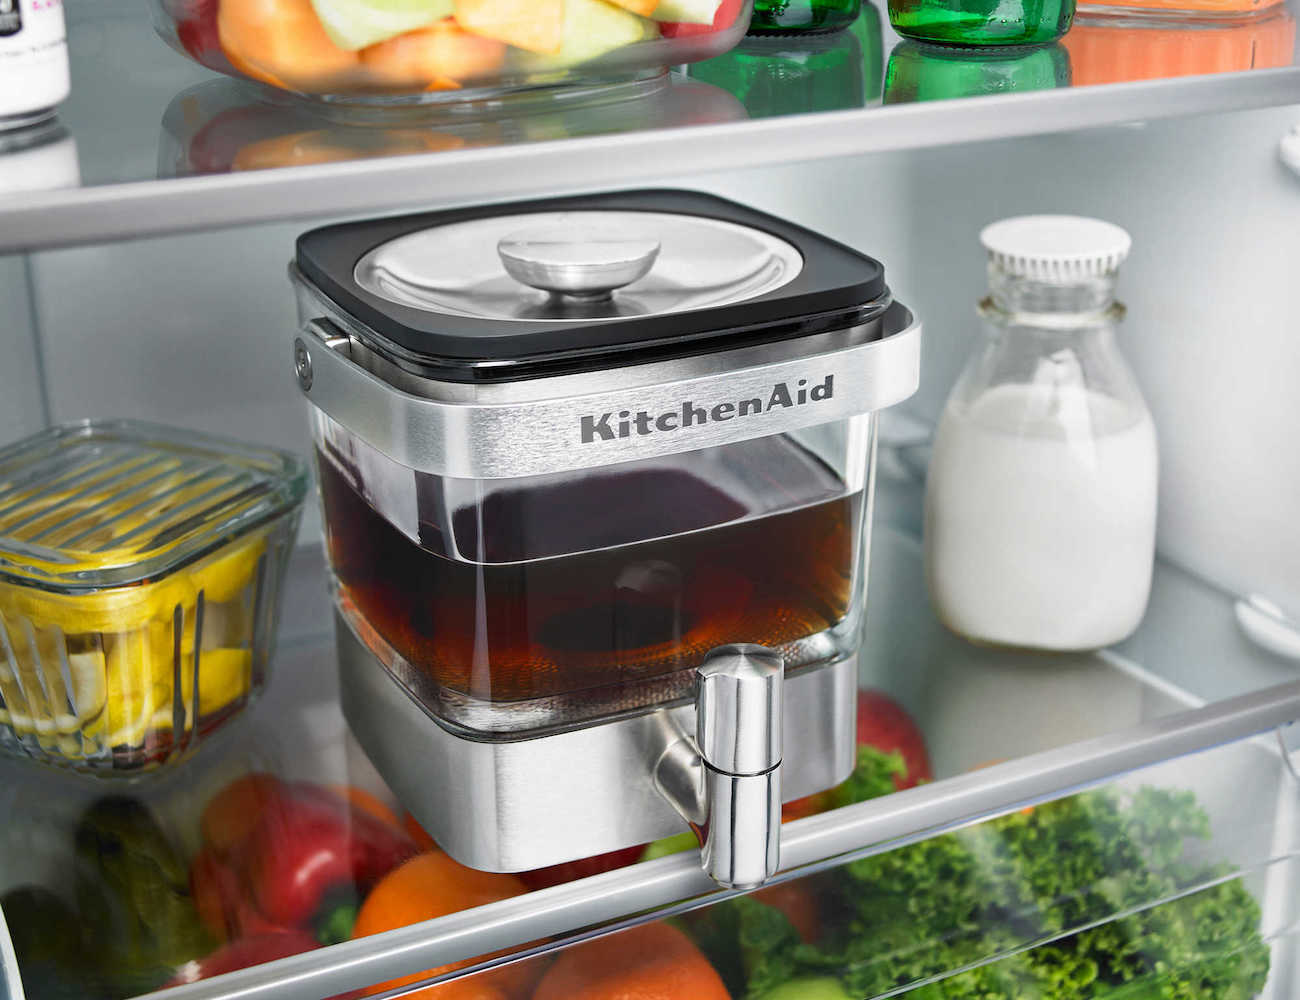 KitchenAid-Cold-Brew-Coffee-Maker-01